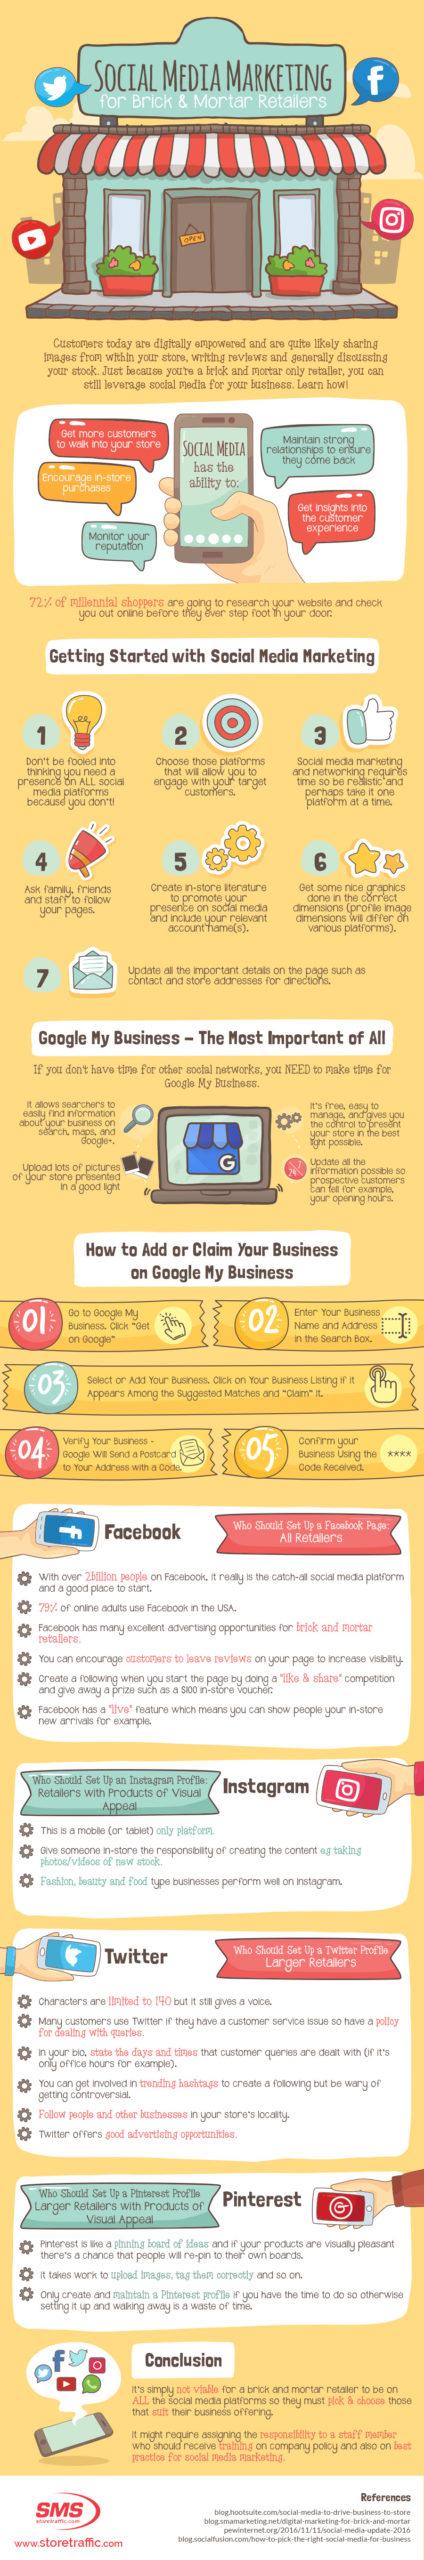 Social Media Marketing for Brick & Mortar - Infographic